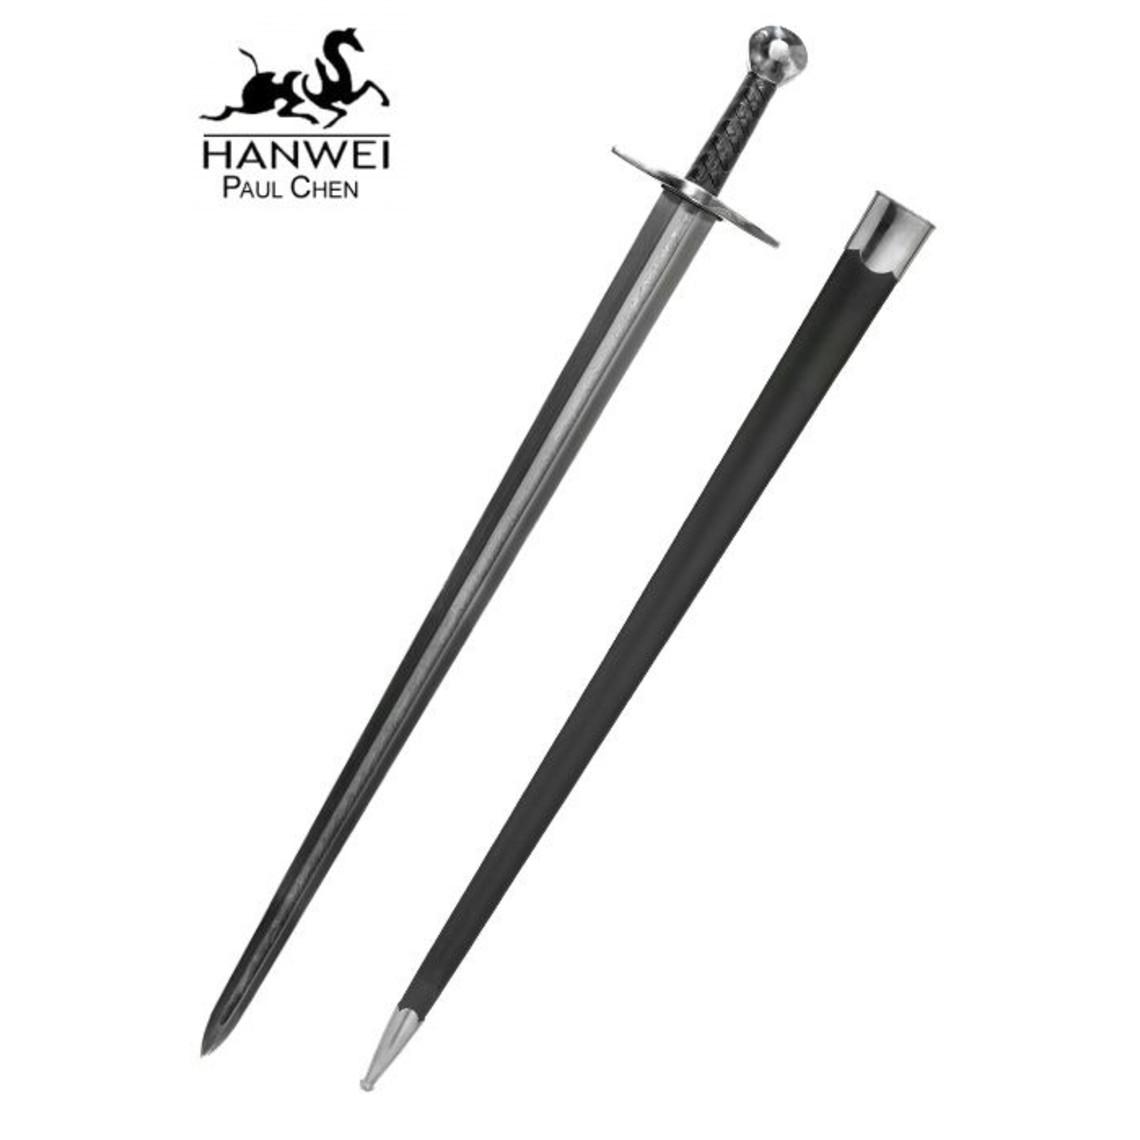 CAS Hanwei Sir William Marshall Espada con hoja de acero de Damasco